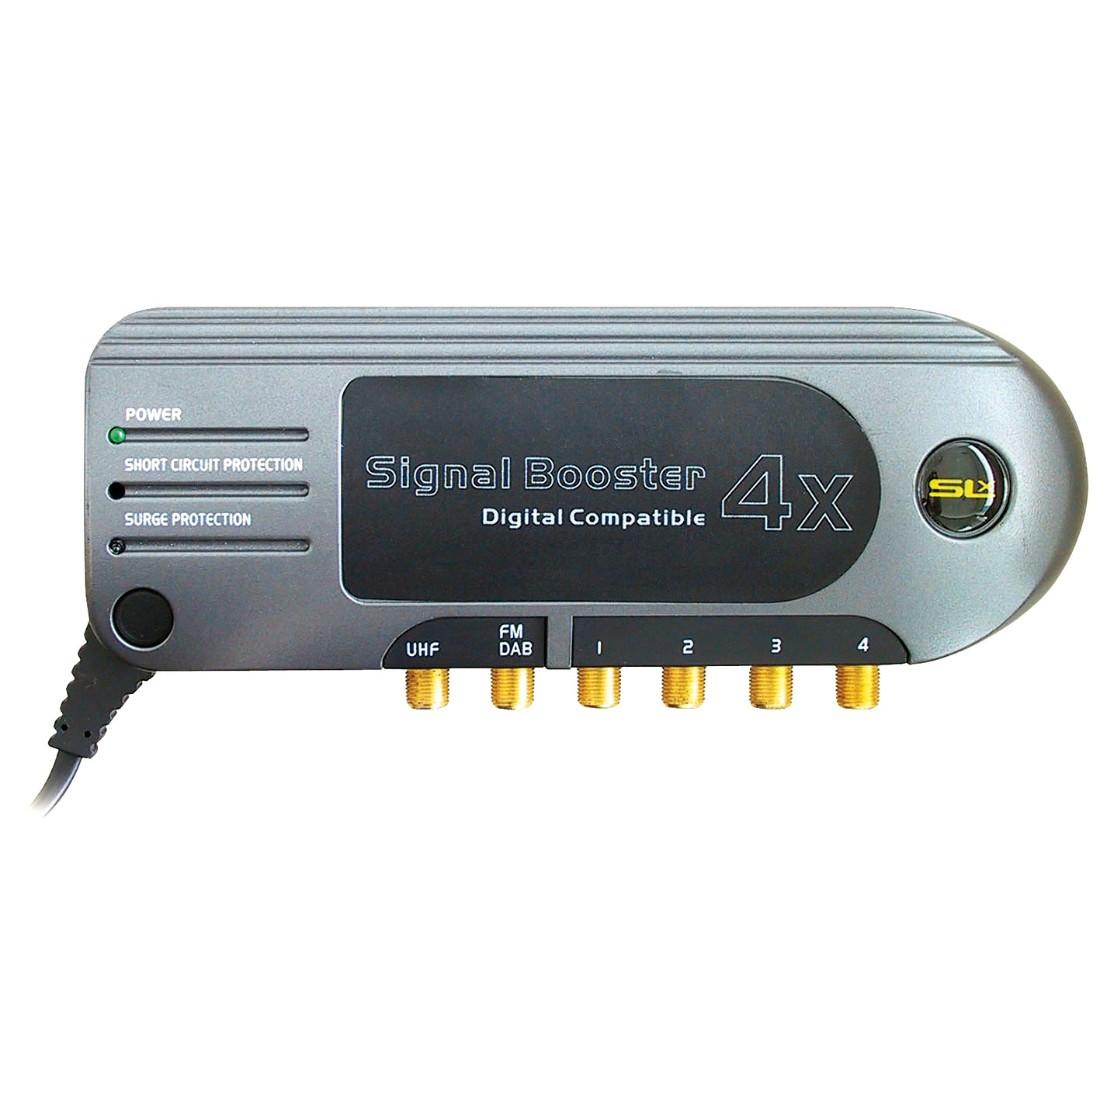 Slx Gold Four Outlet Satellite Distribution Amplifier 4g